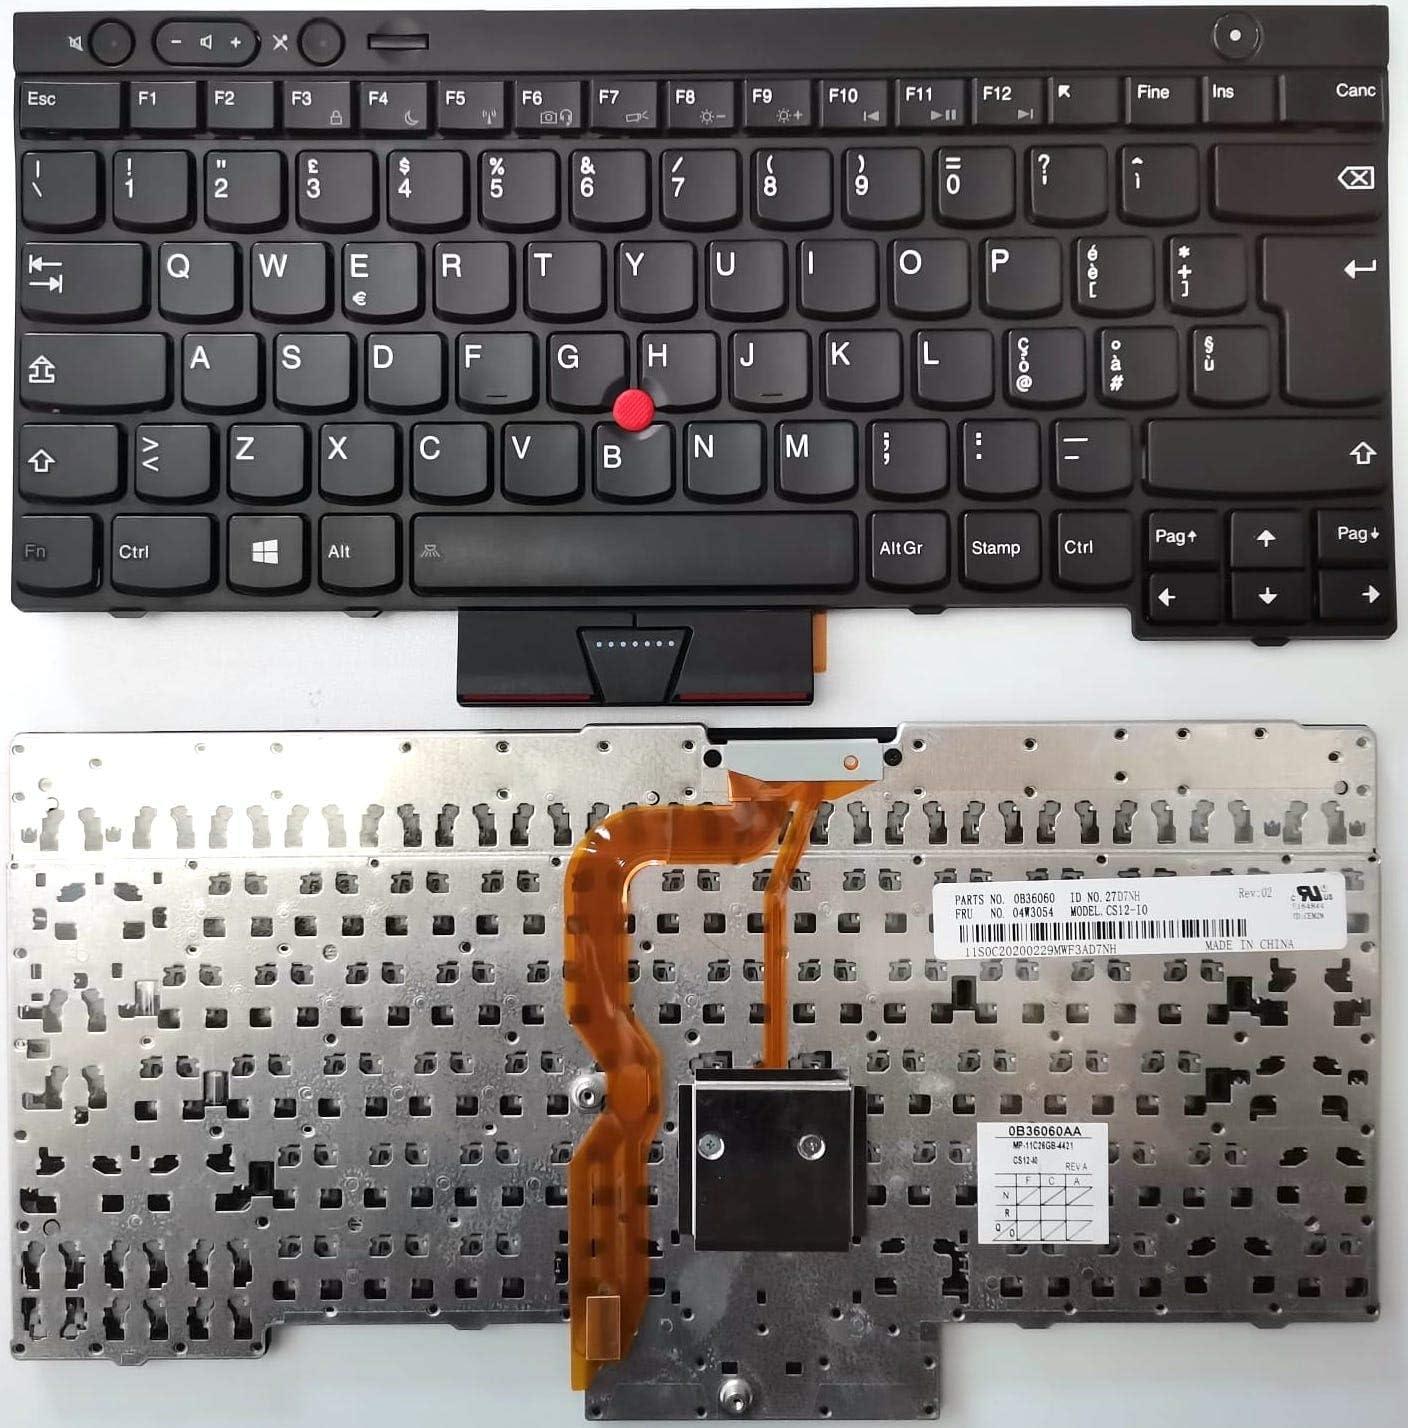 Tastiera Italiana Compatibile con Notebook Lenovo ThinkPad X230 X230i X230t W530 T530 L430 L530 T430 T430i T430S T430SI New Net Keyboards